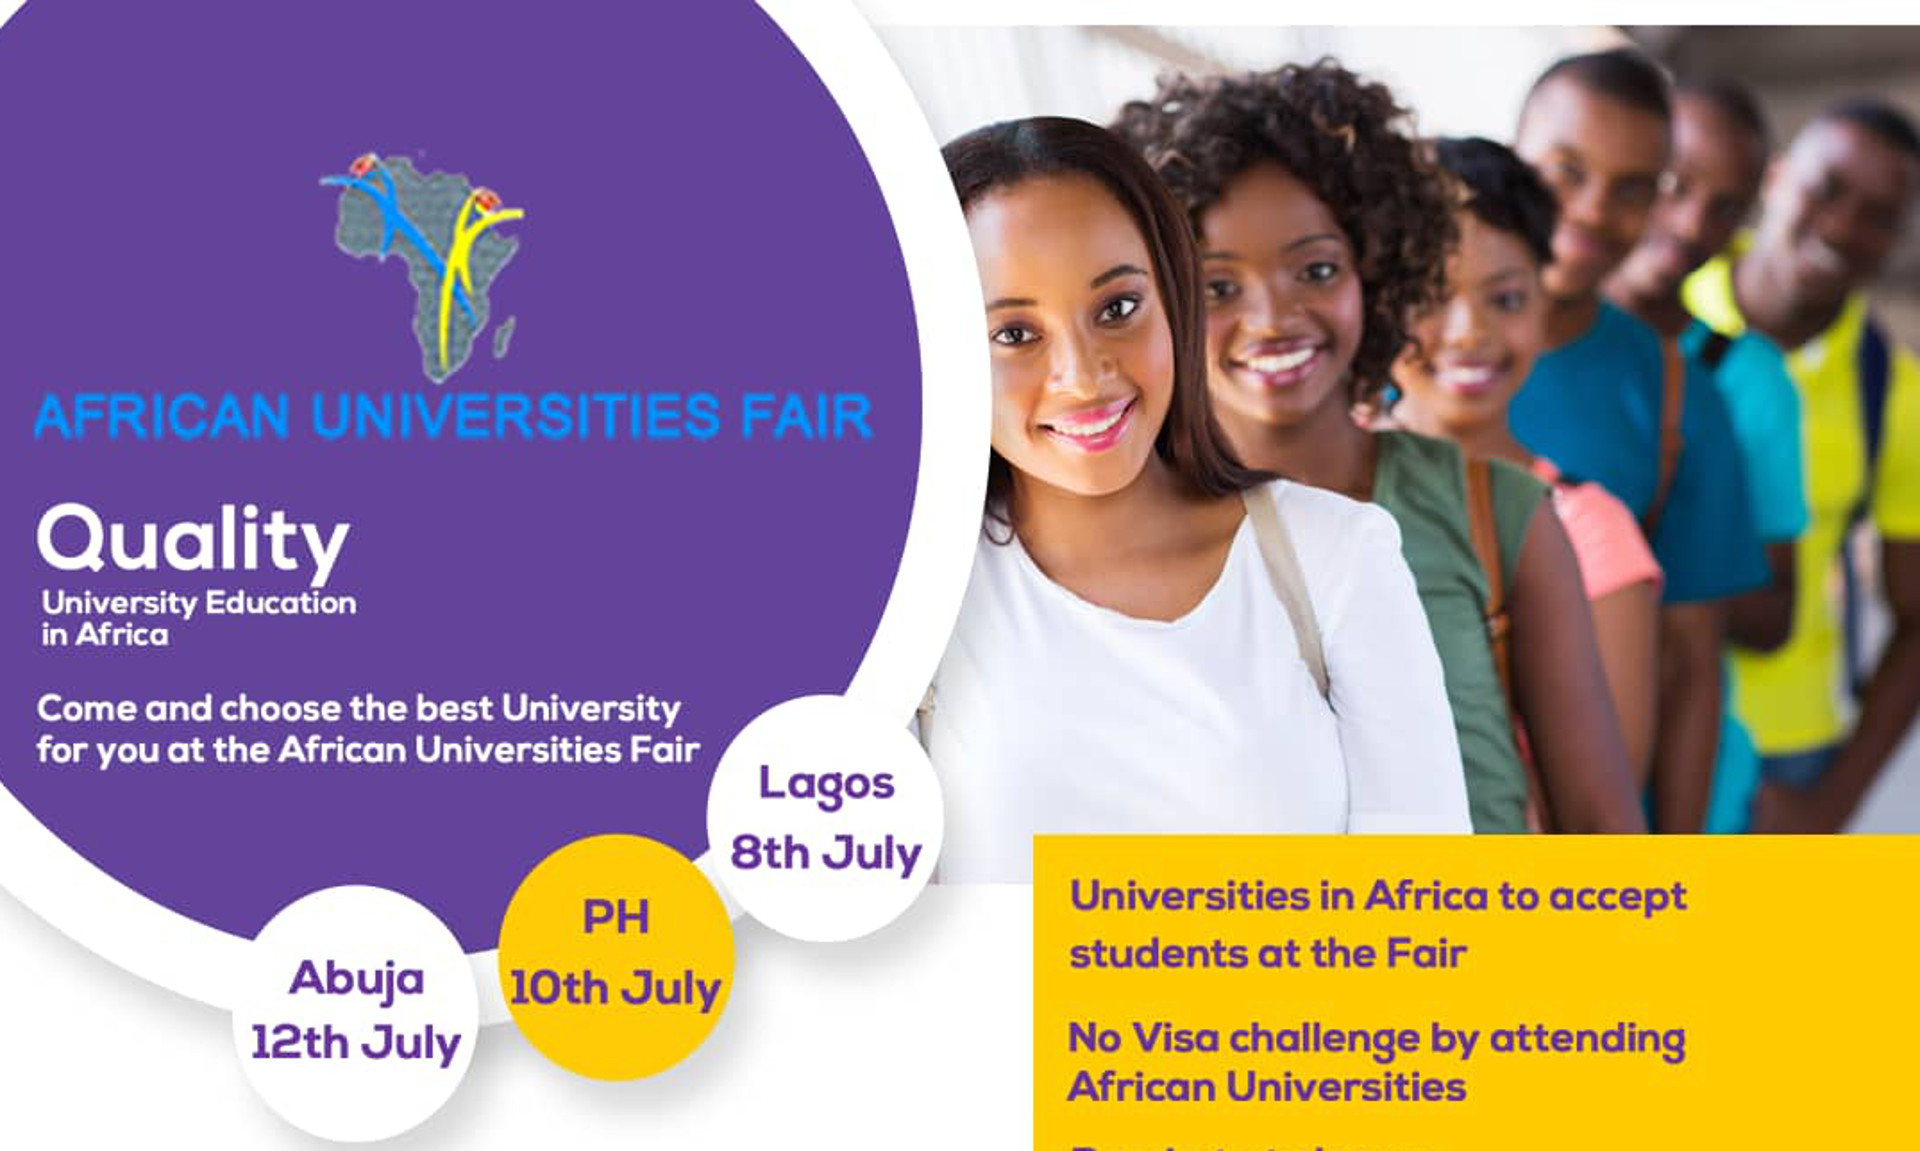 African Universities Fair